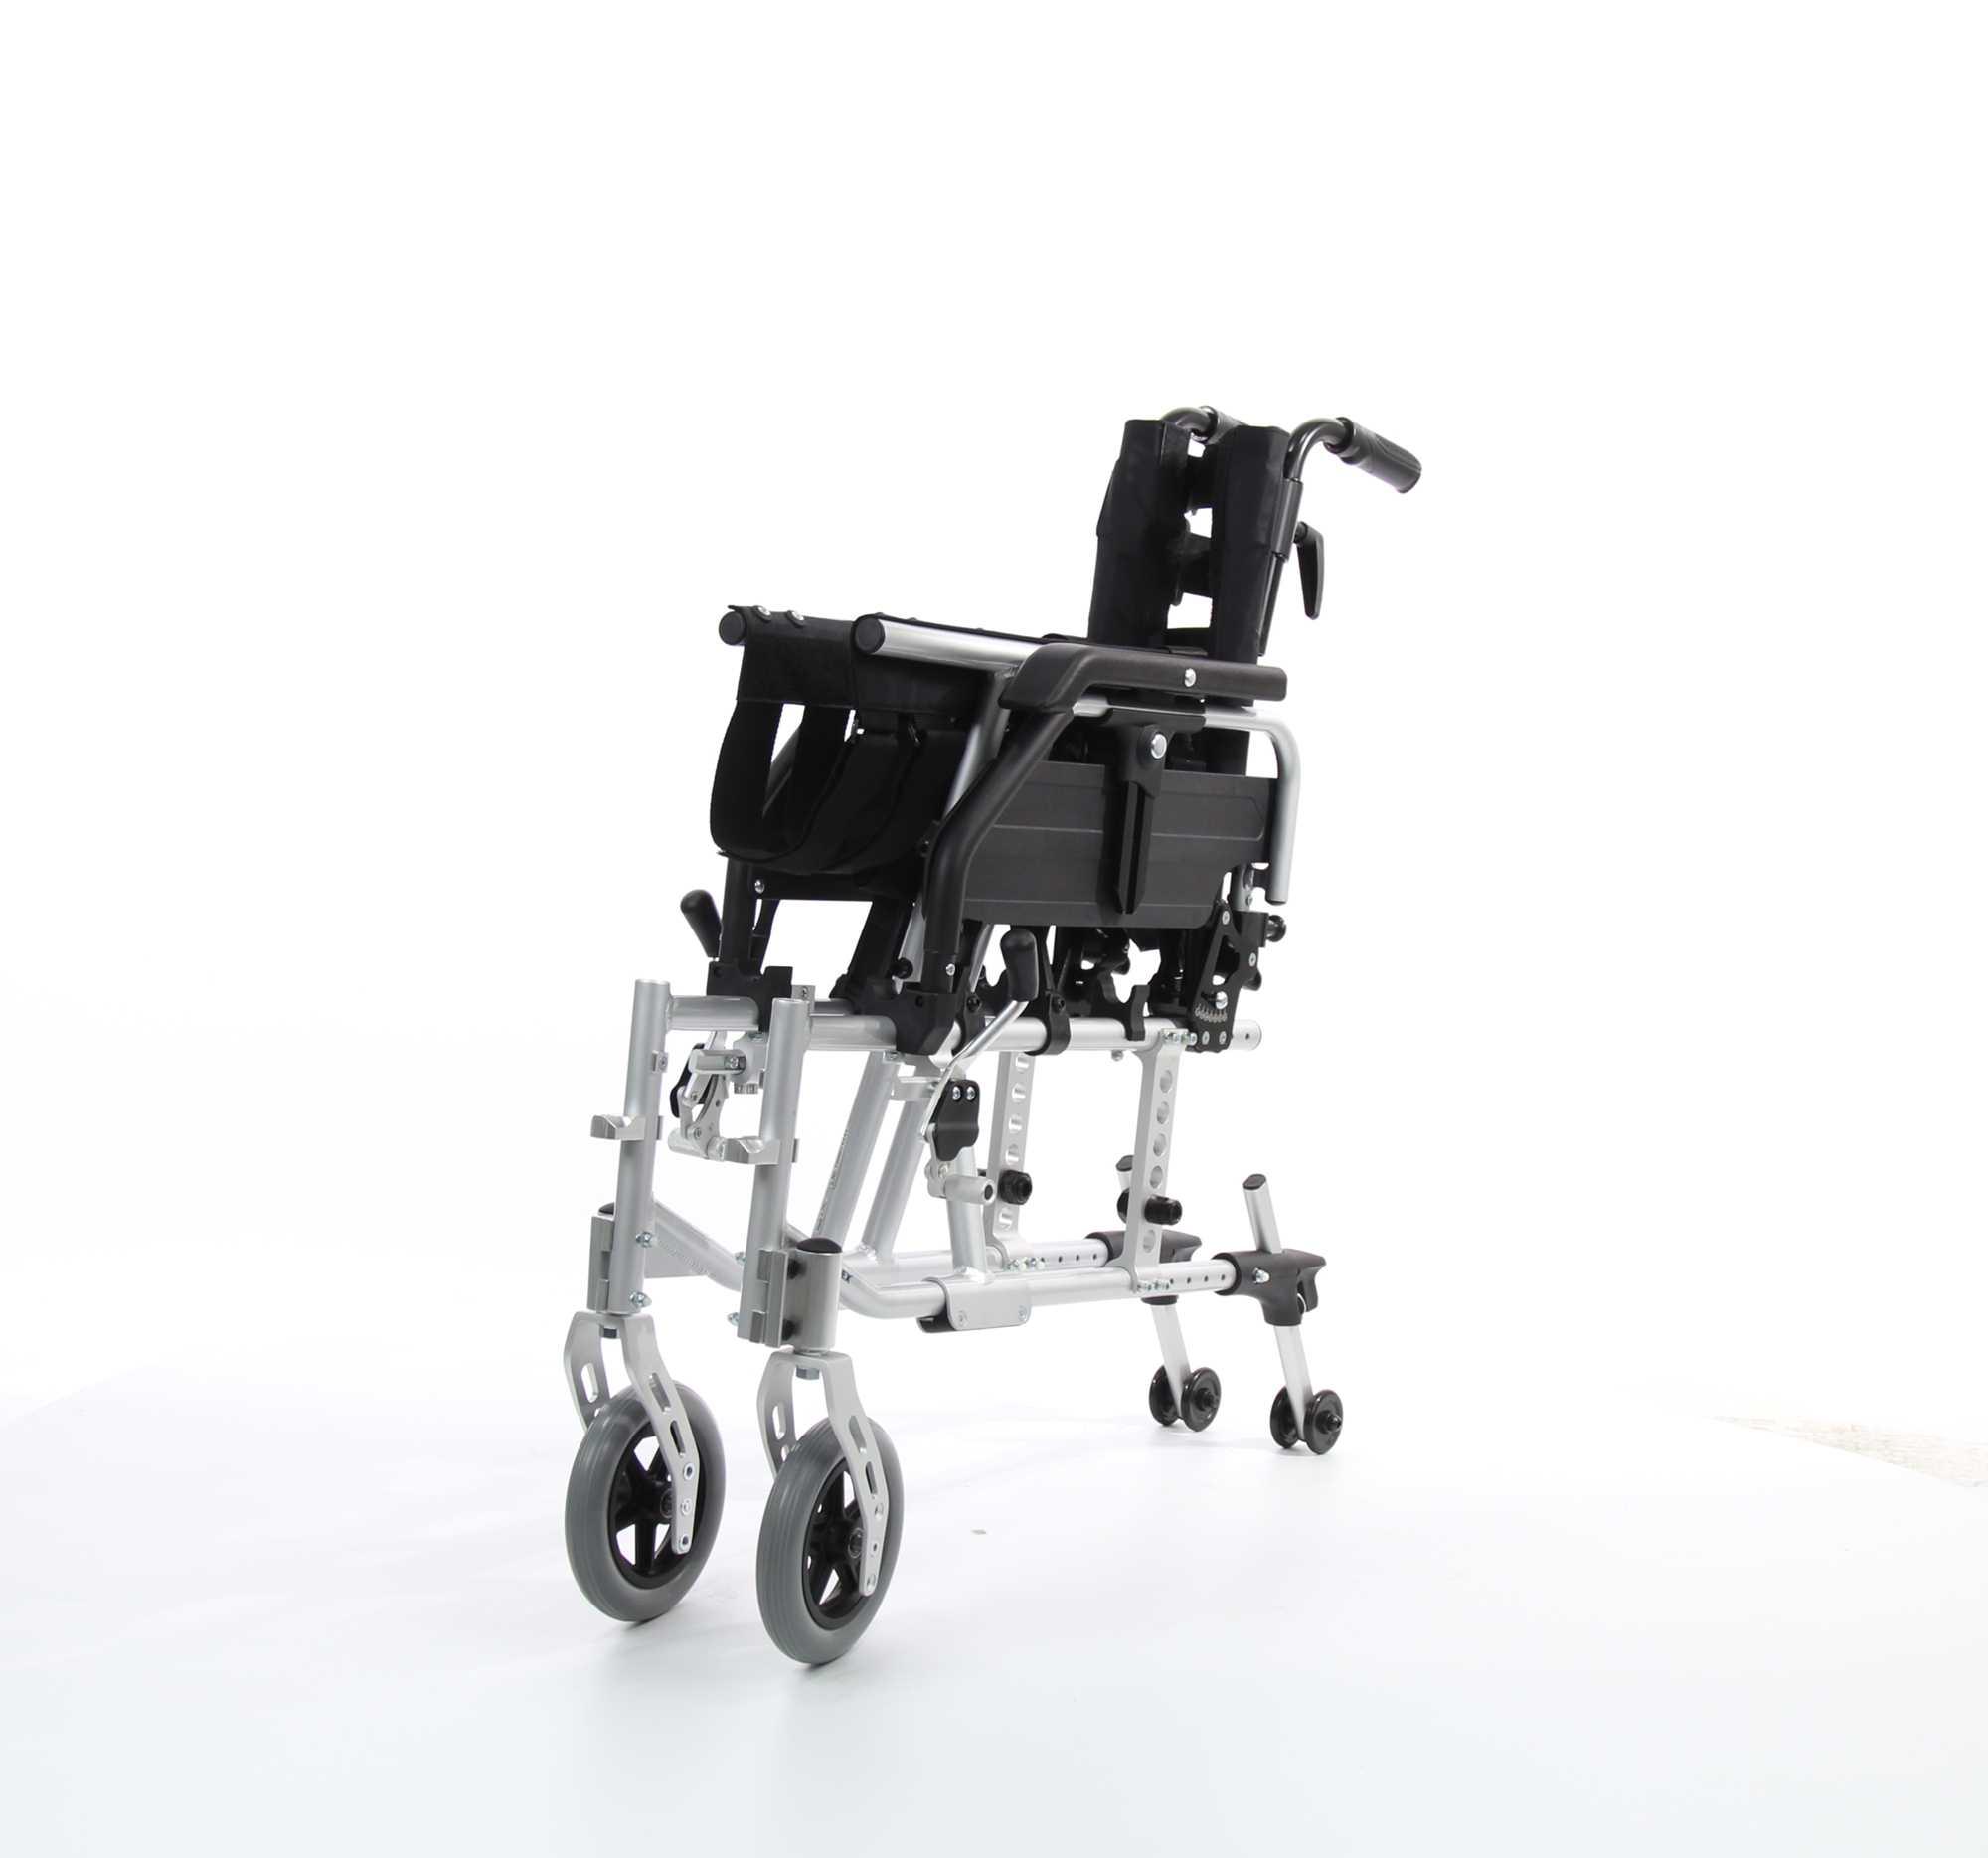 WOLLEX WG-M735 Aluminyum Manuel Tekerlekli Sandalye